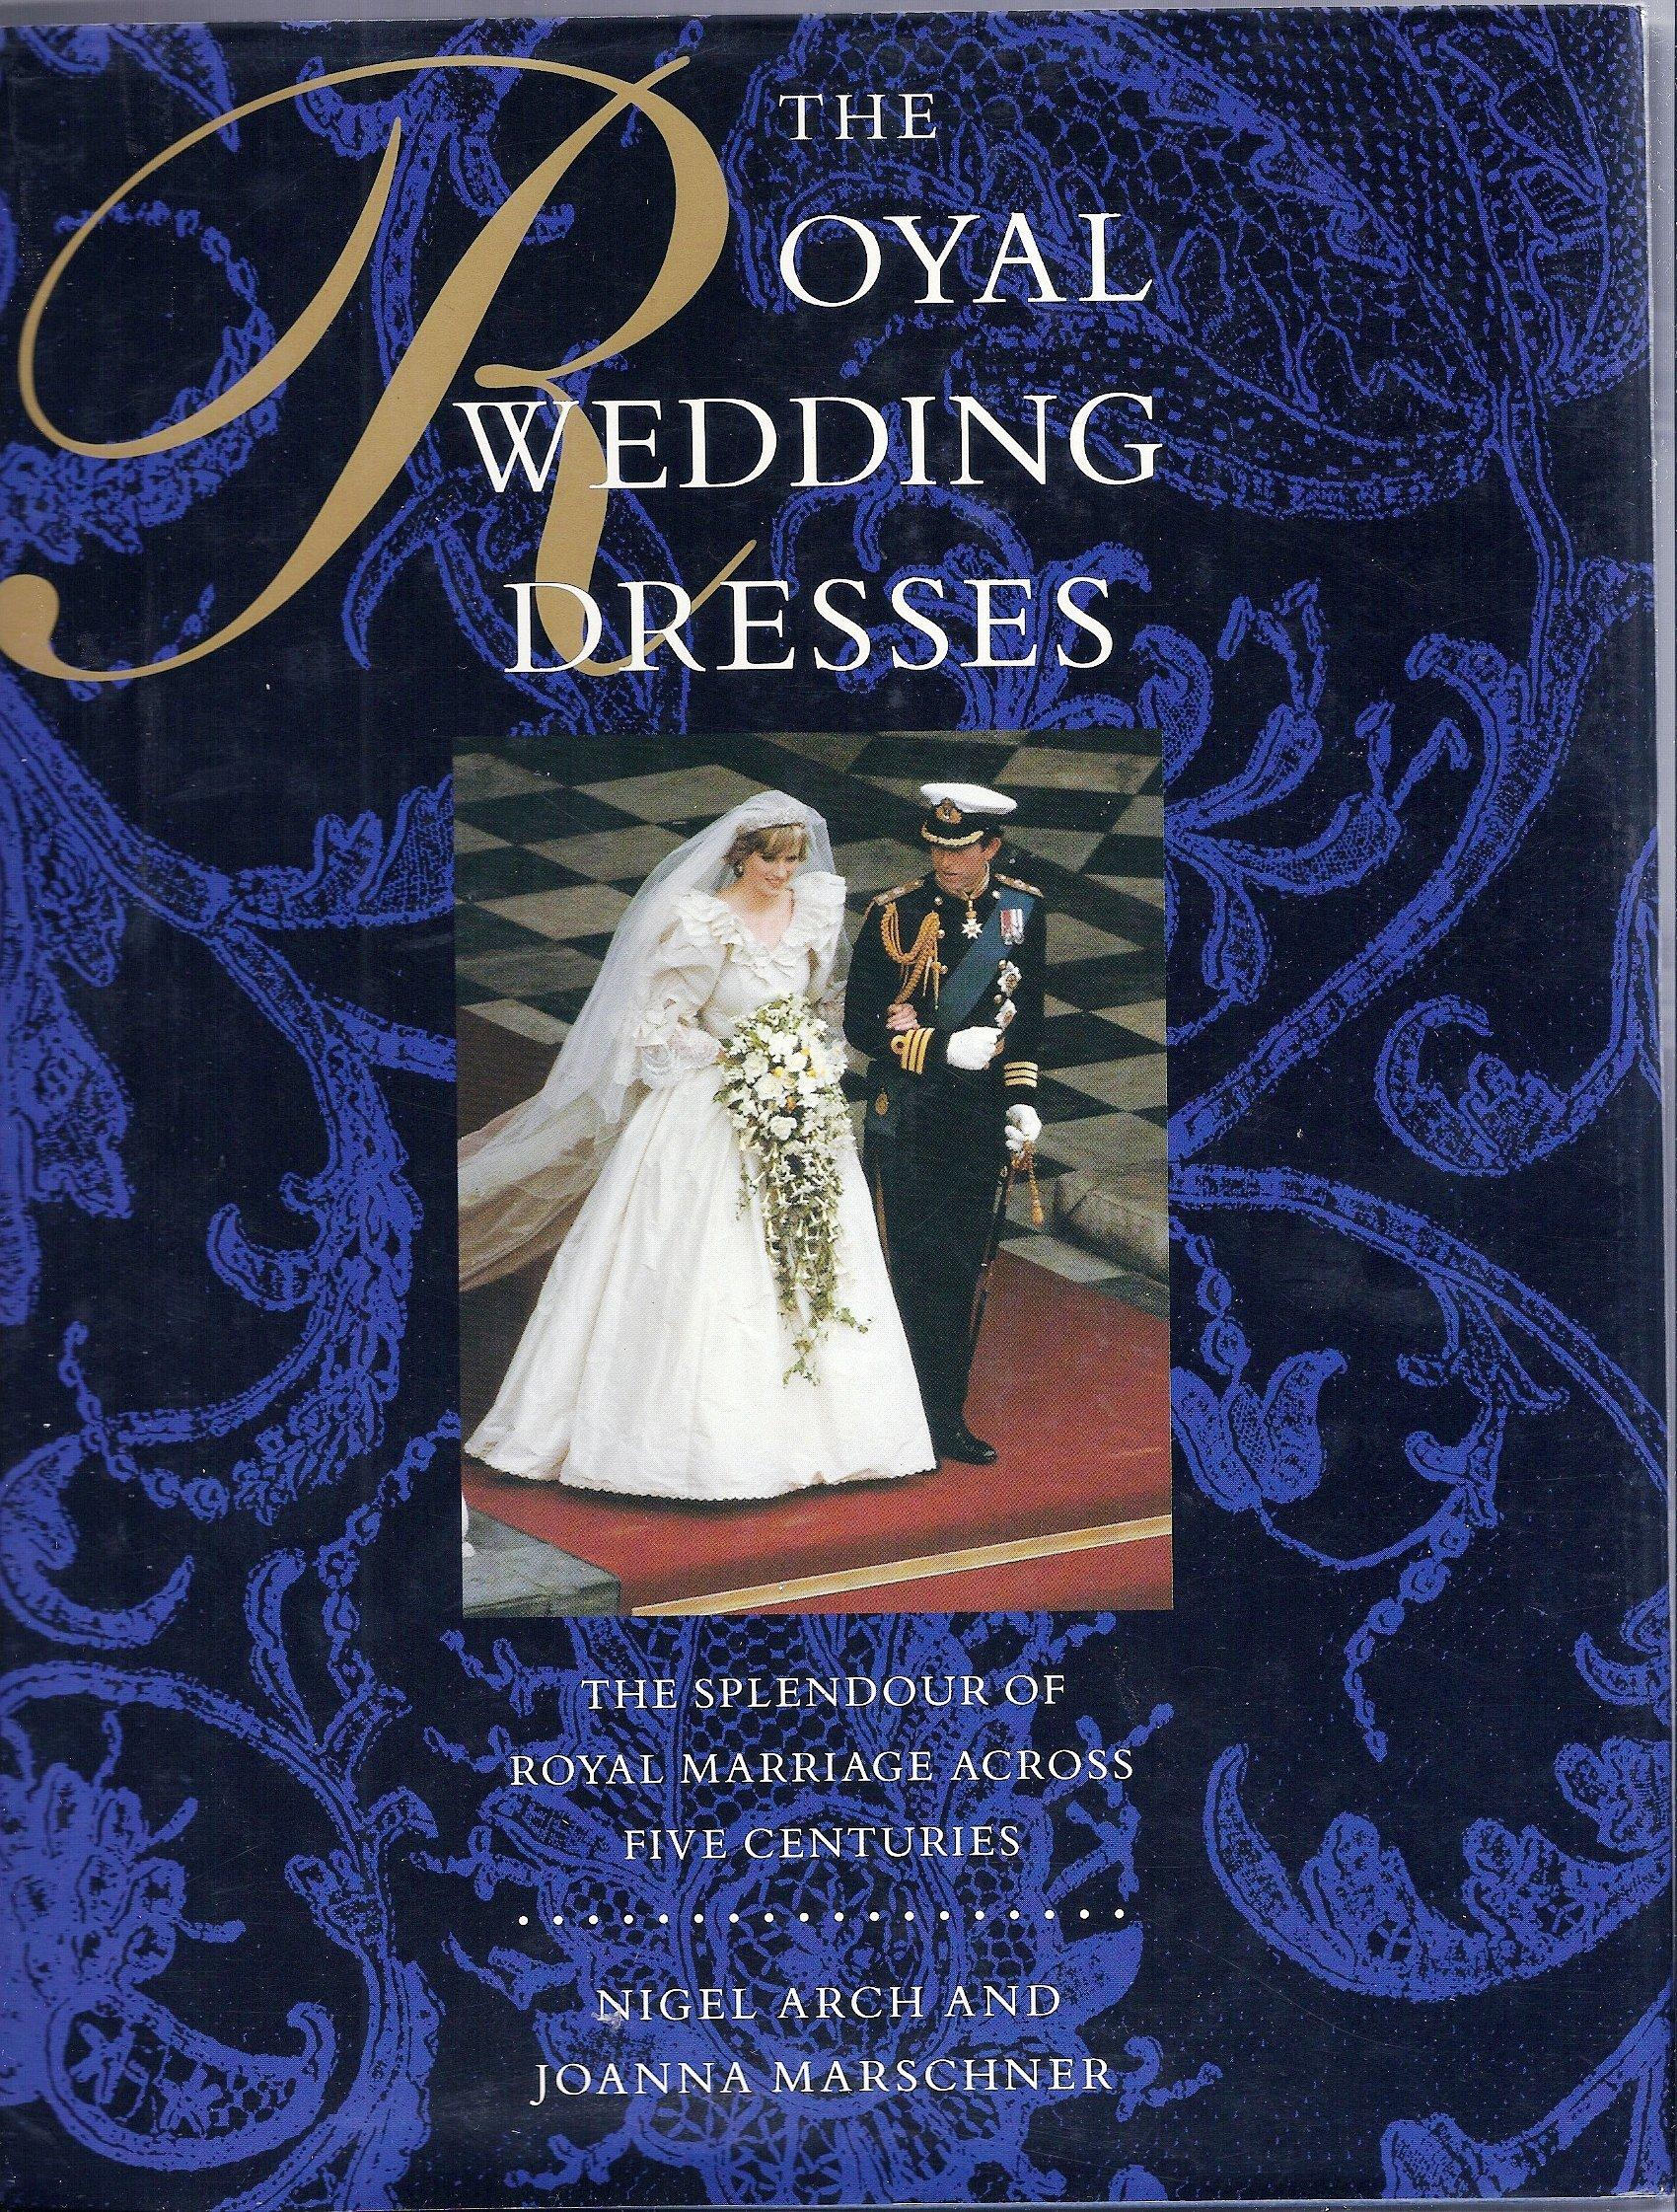 The Royal Wedding Dresses